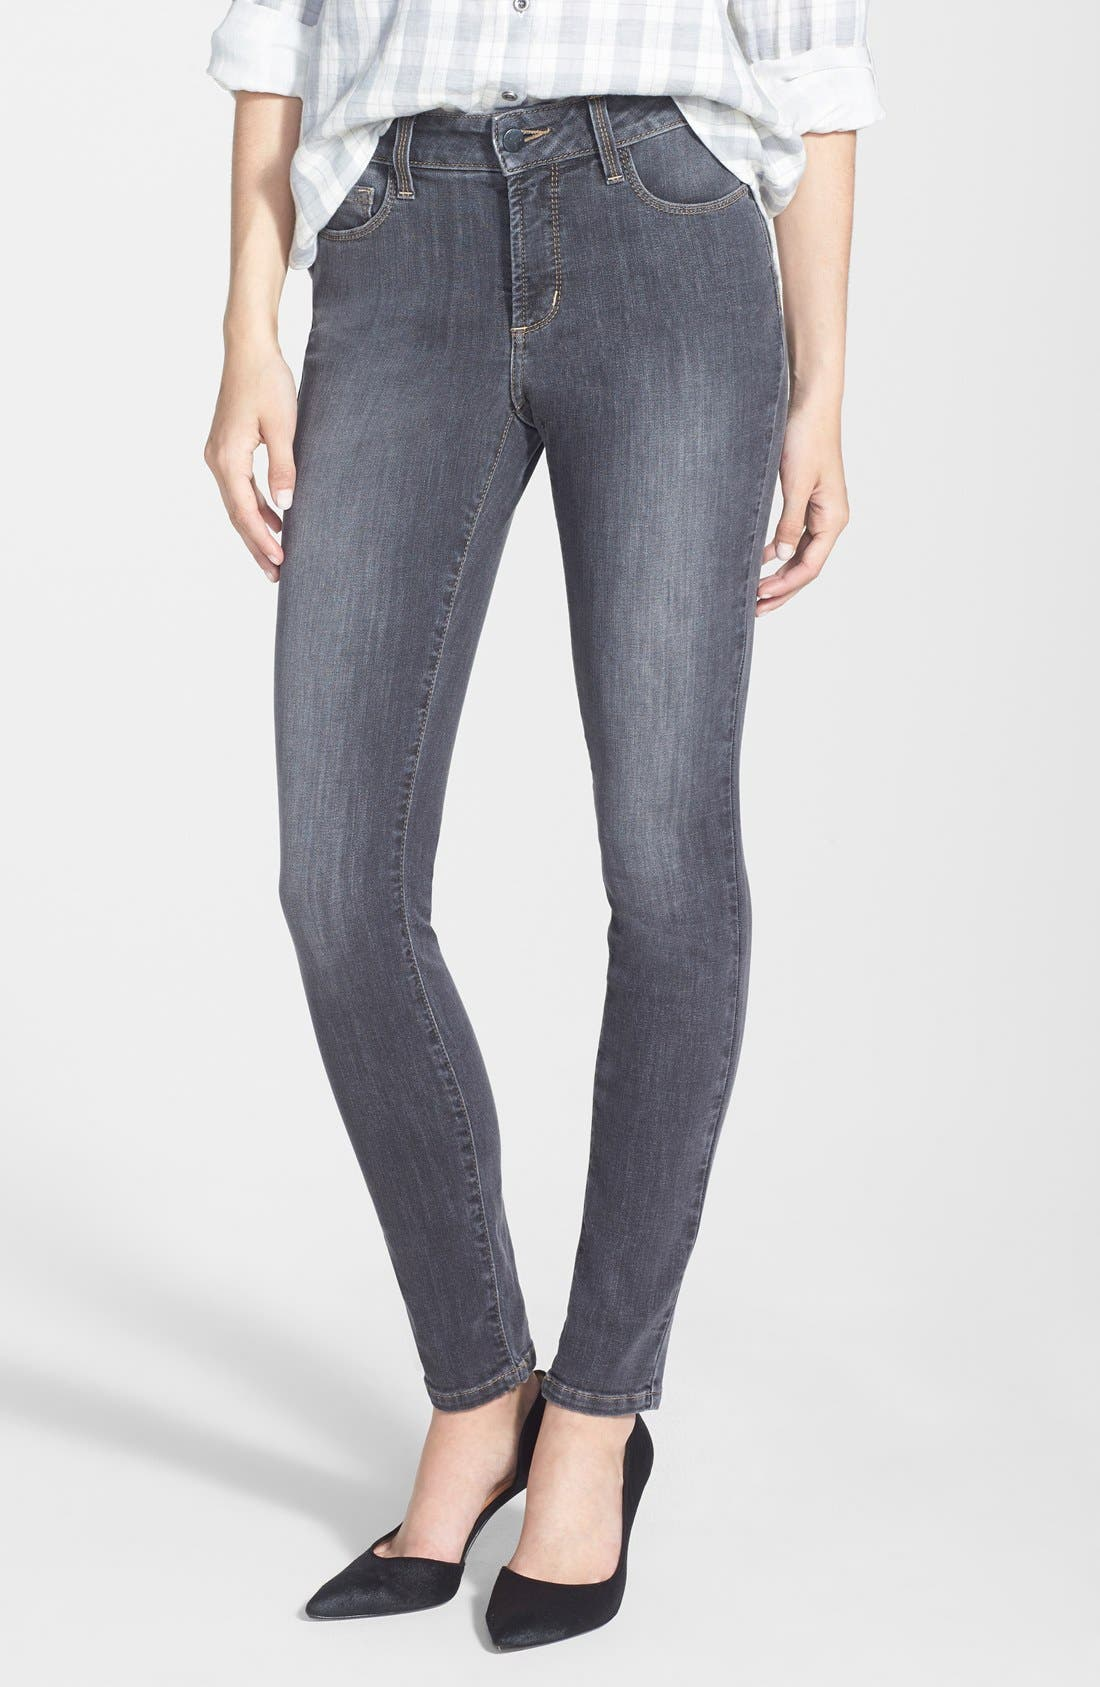 Alternate Image 1 Selected - NYDJ 'Ami' Stretch Skinny Jeans (Dakota) (Regular & Petite)